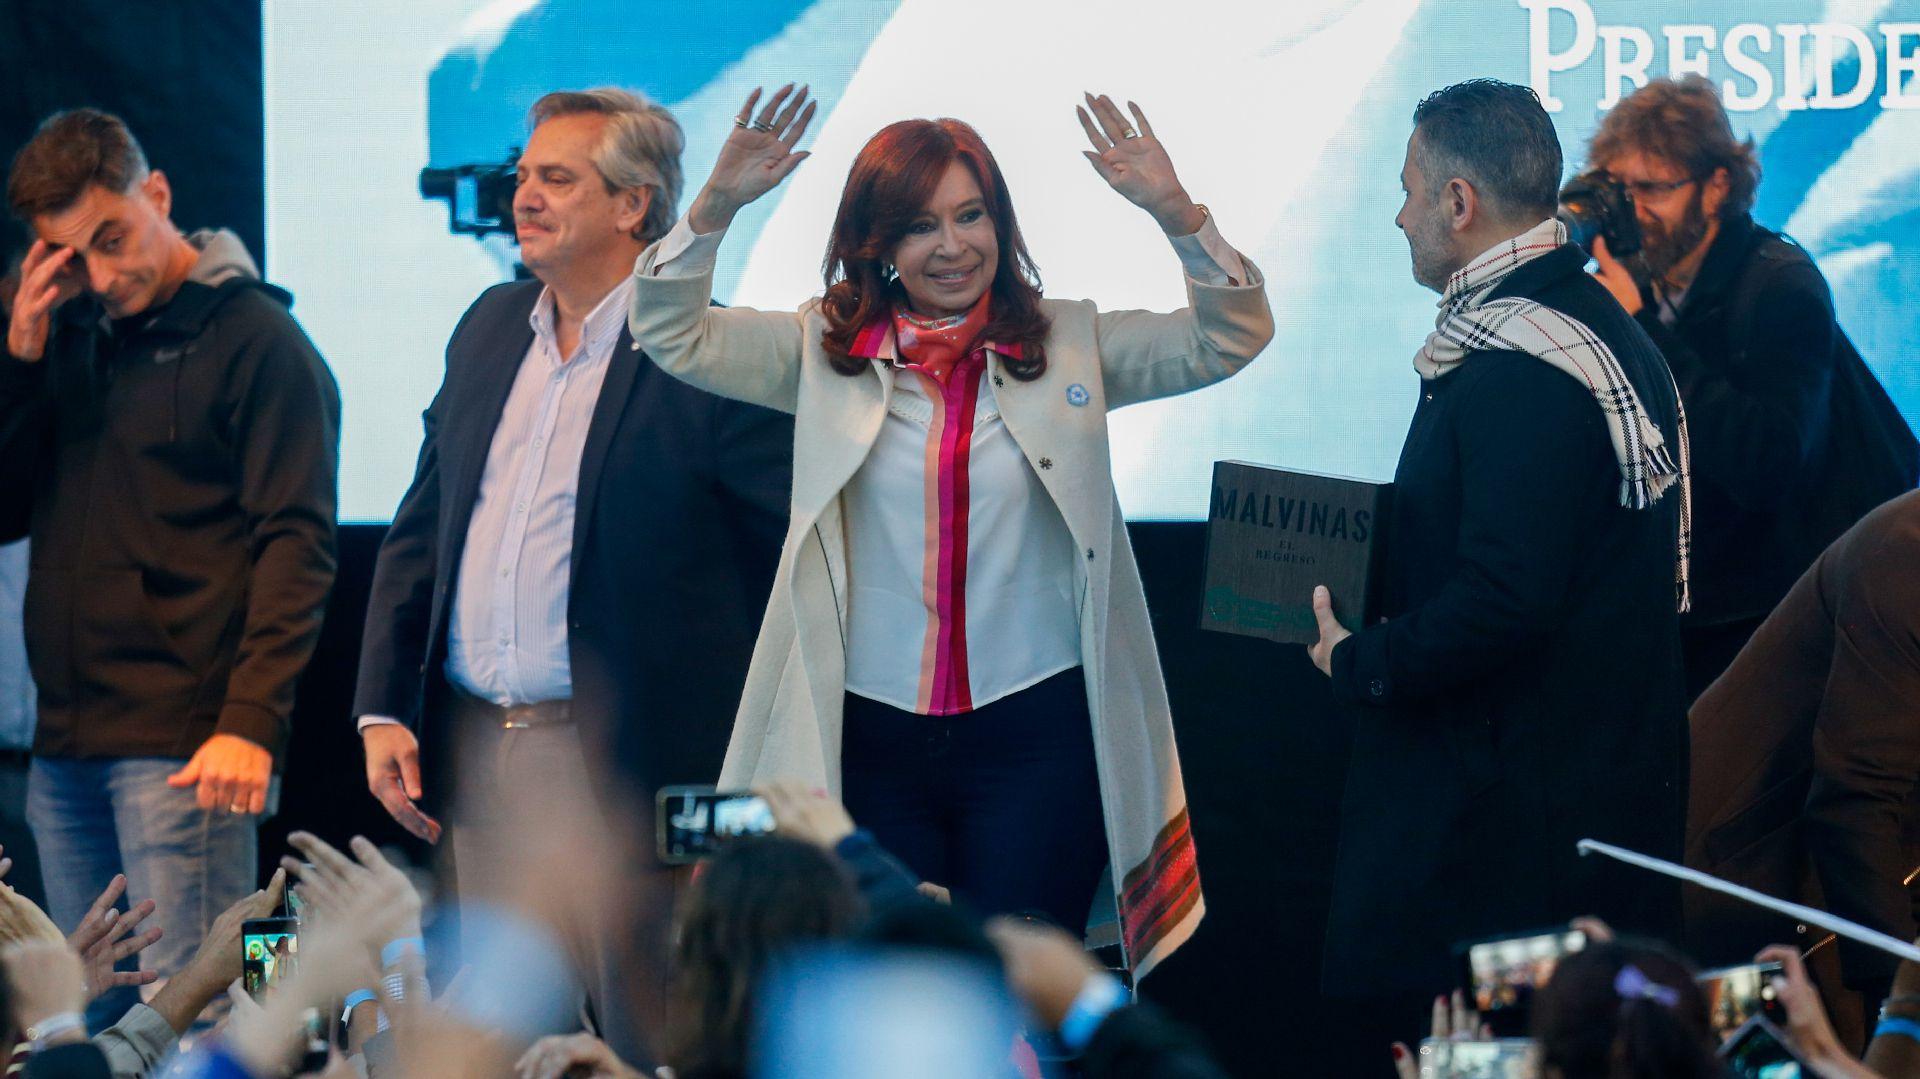 Alberto Fernández y Cristina Kirchner. (Nicolás Aboaf)